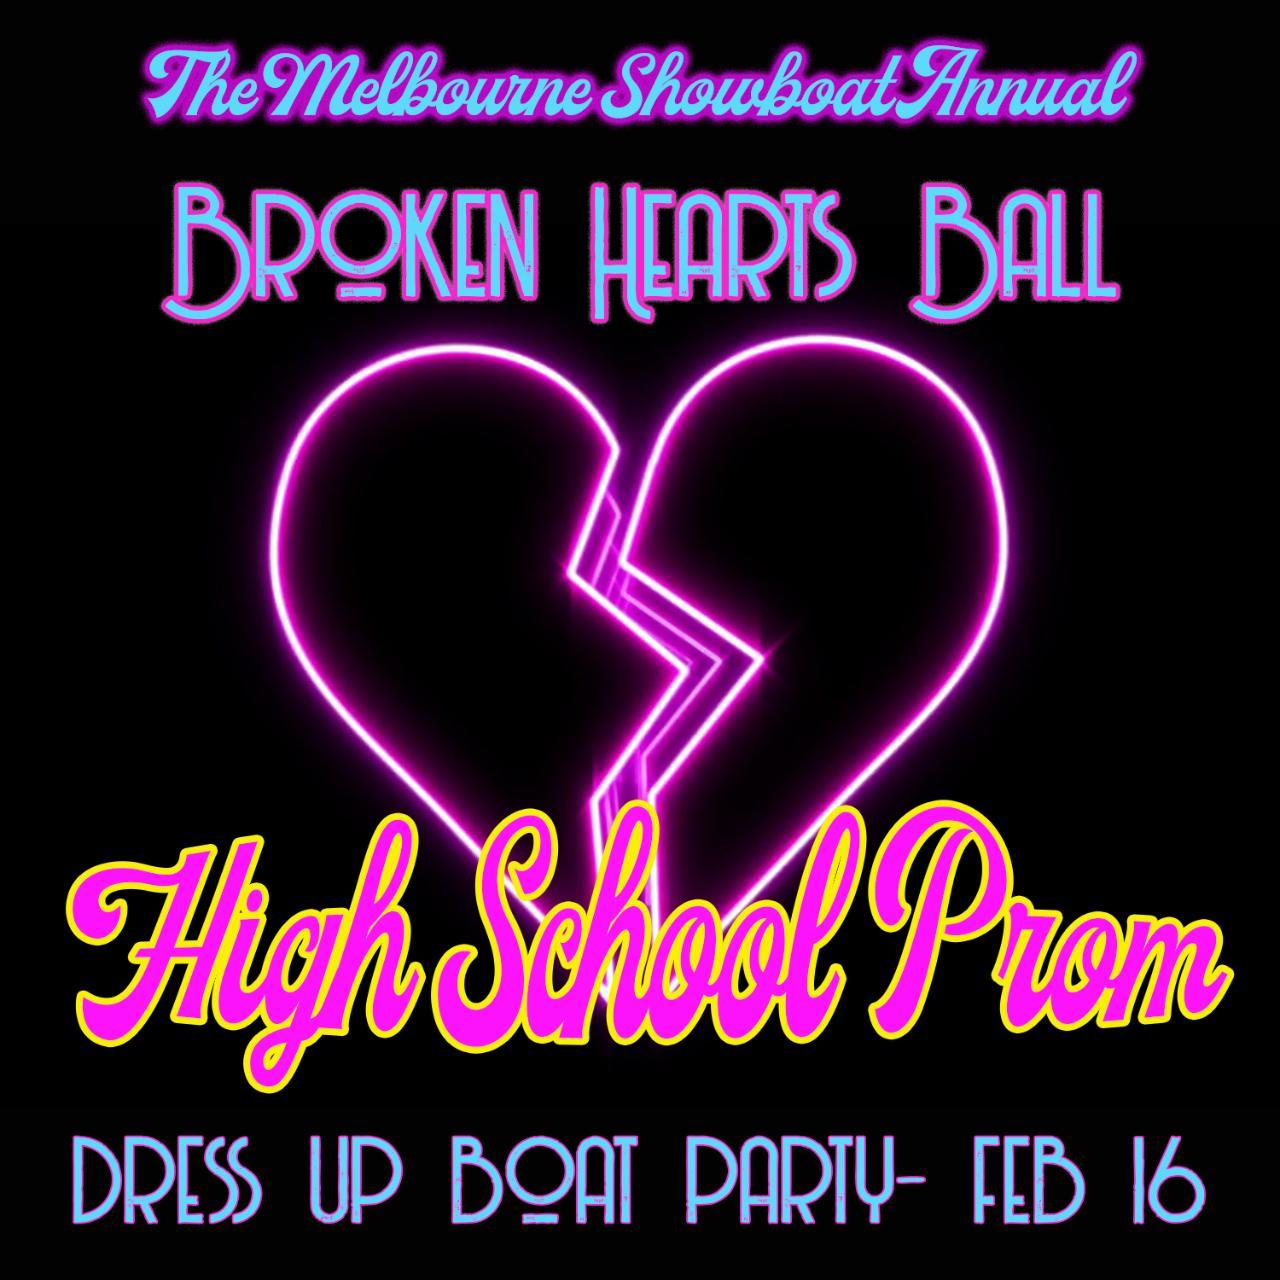 The Annual Broken Hearts Ball - High School Prom Theme